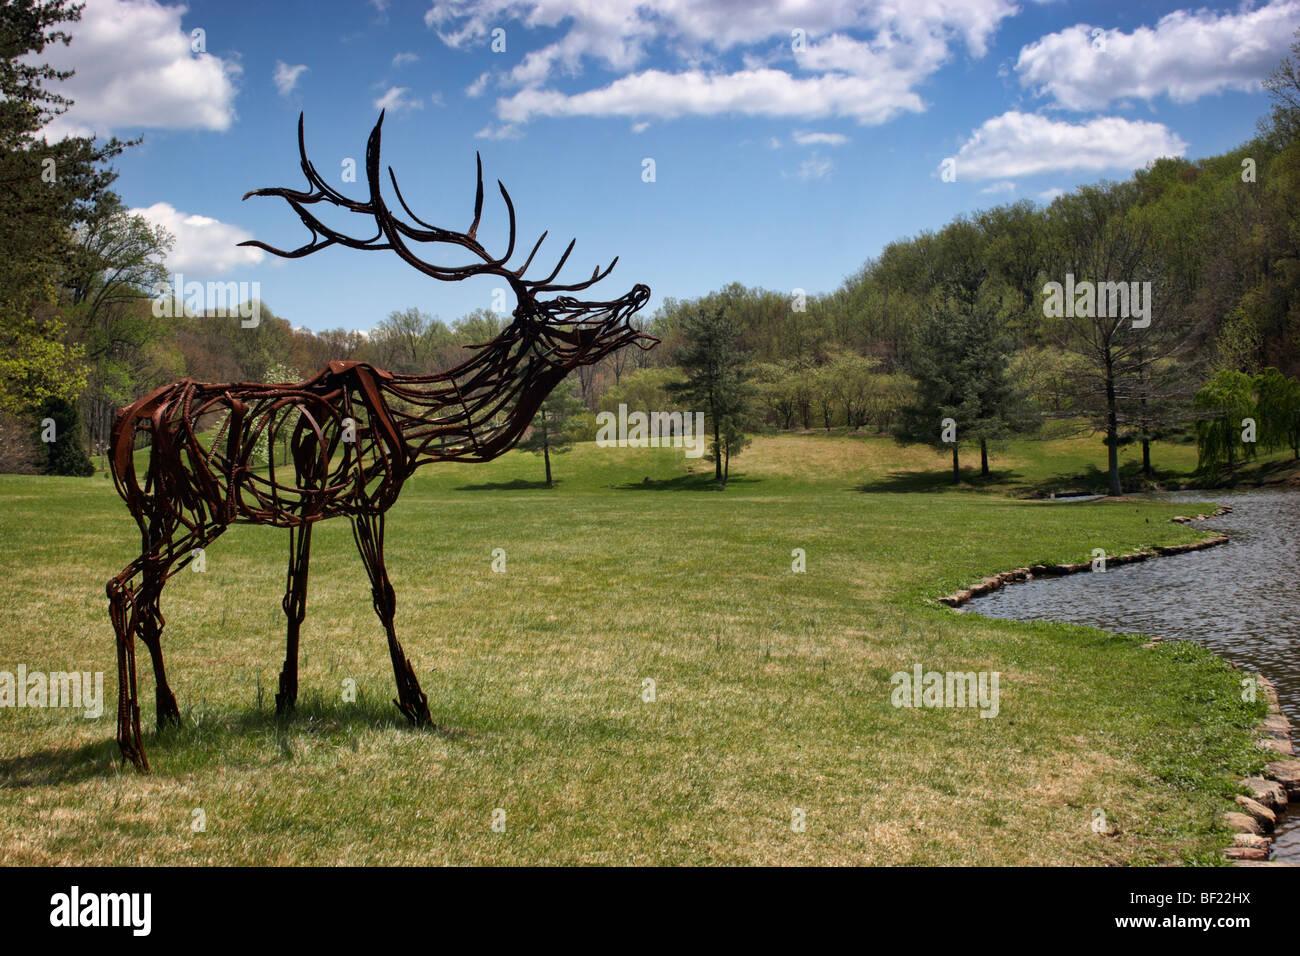 A Metal Sculpture Of A Moose On Loan To Meadowlark Botanical Gardens, Vienna,  VA